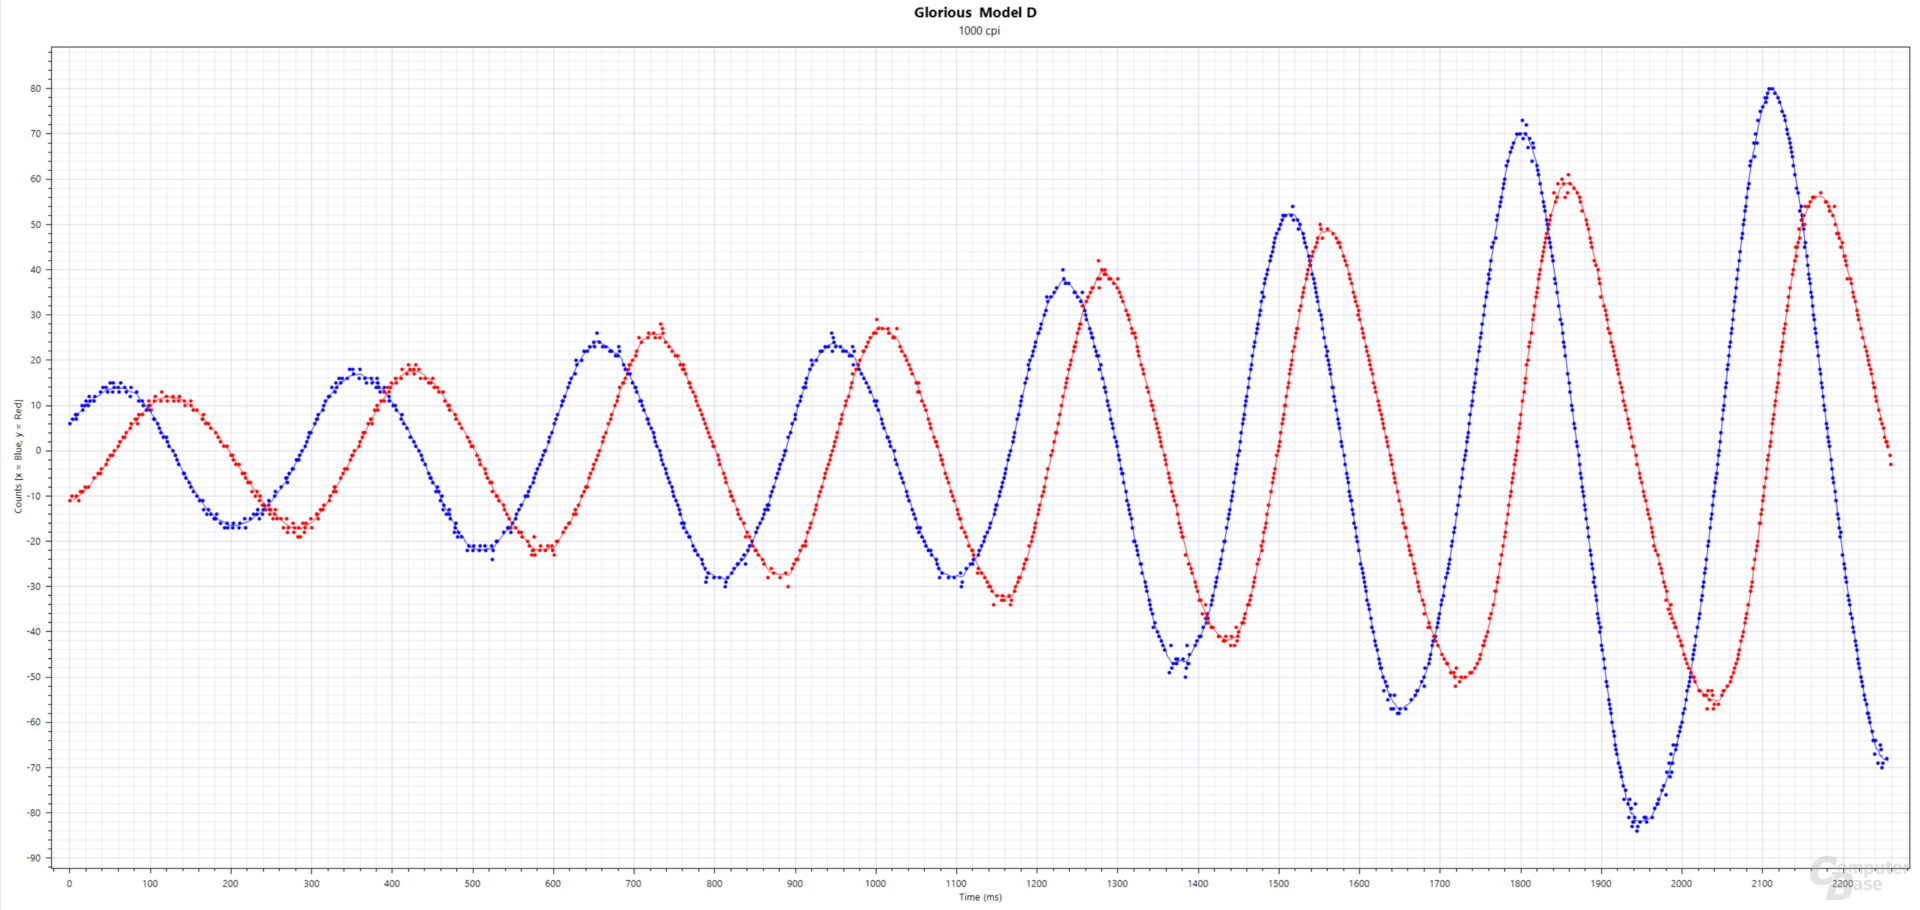 Blau: xCounts(ms), Rot: yCounts(ms); Glorious Model D (PixArt PMW-3360, 1.000 cpi, 1.000 Hertz, Stoffmauspad)